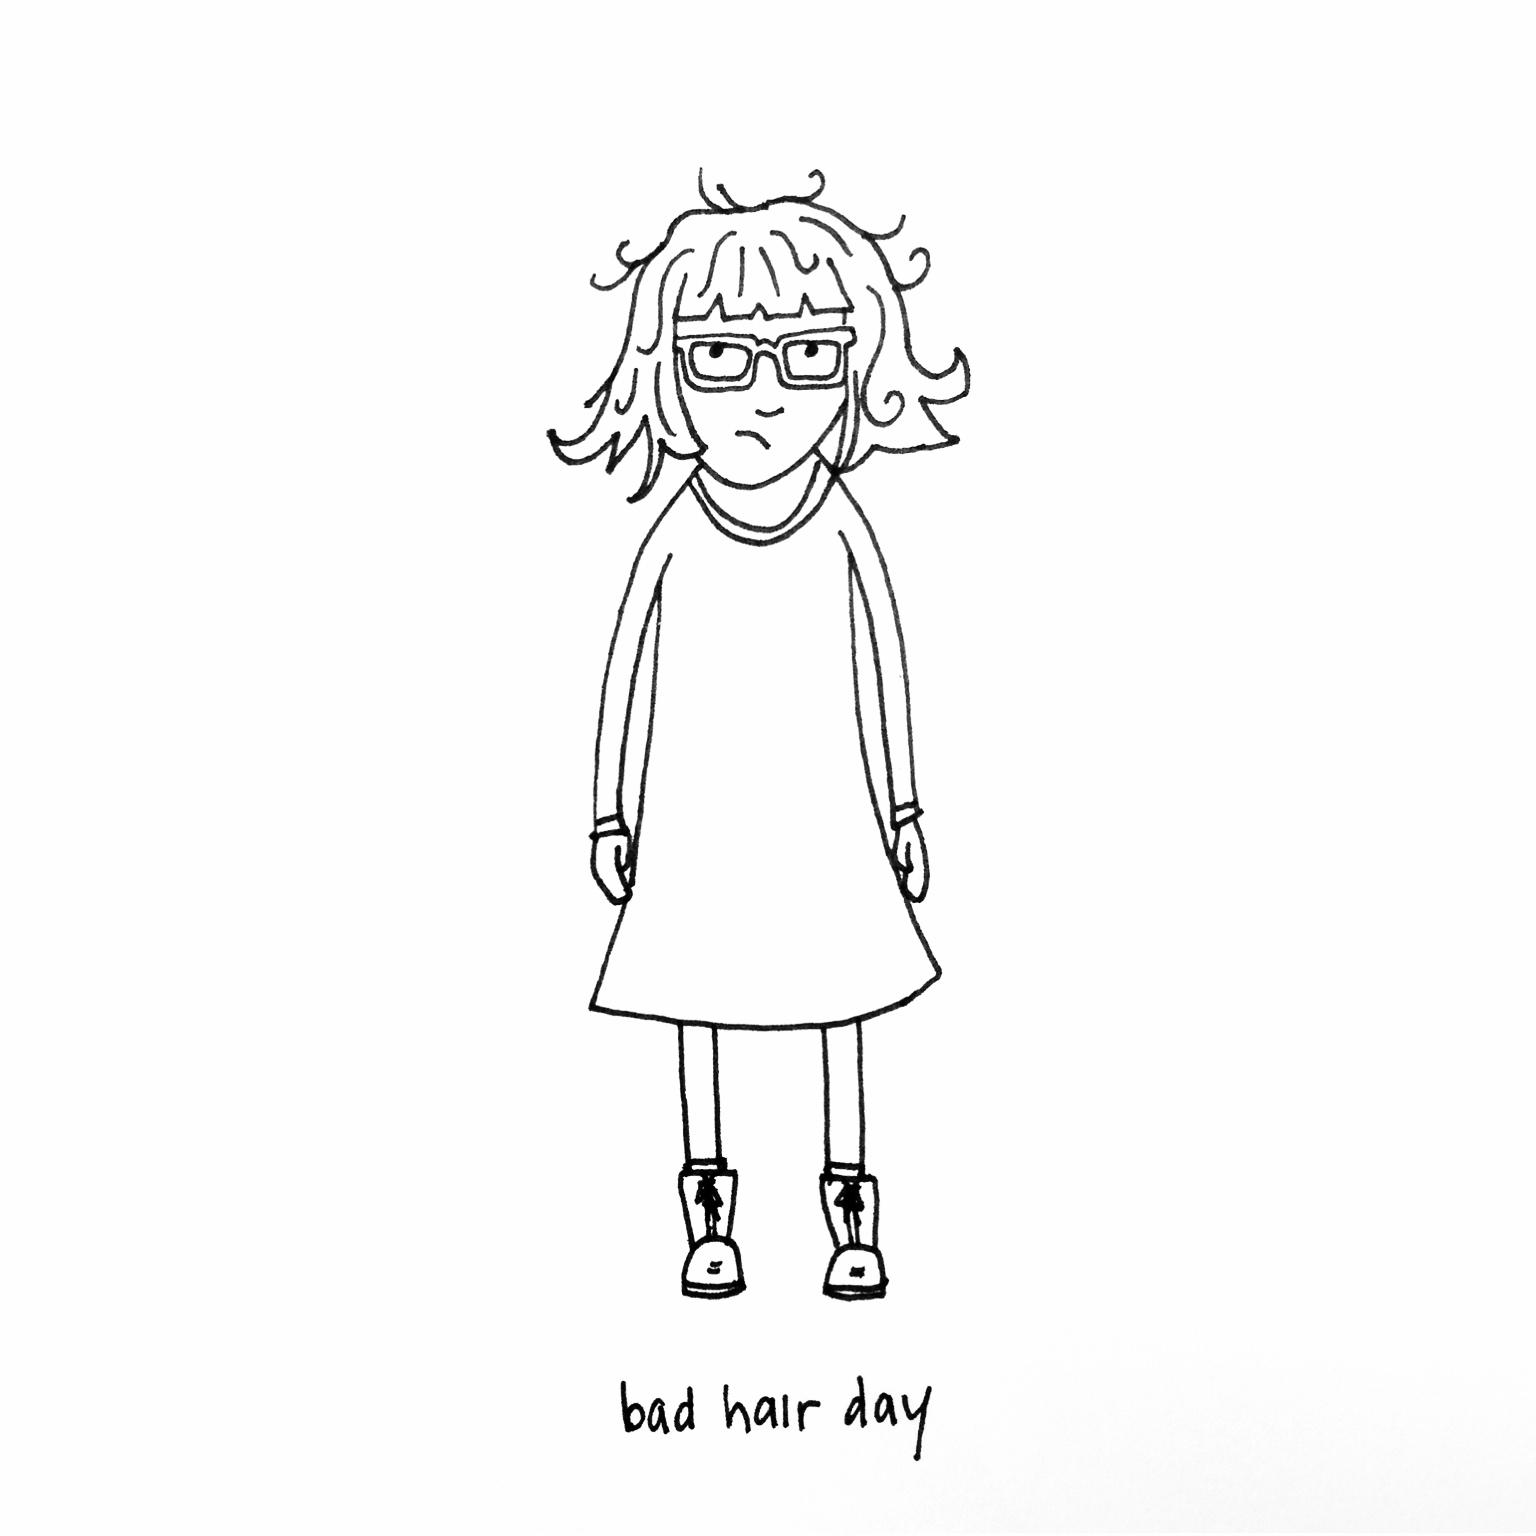 011_lucy-chen-bad-hair-day.jpg